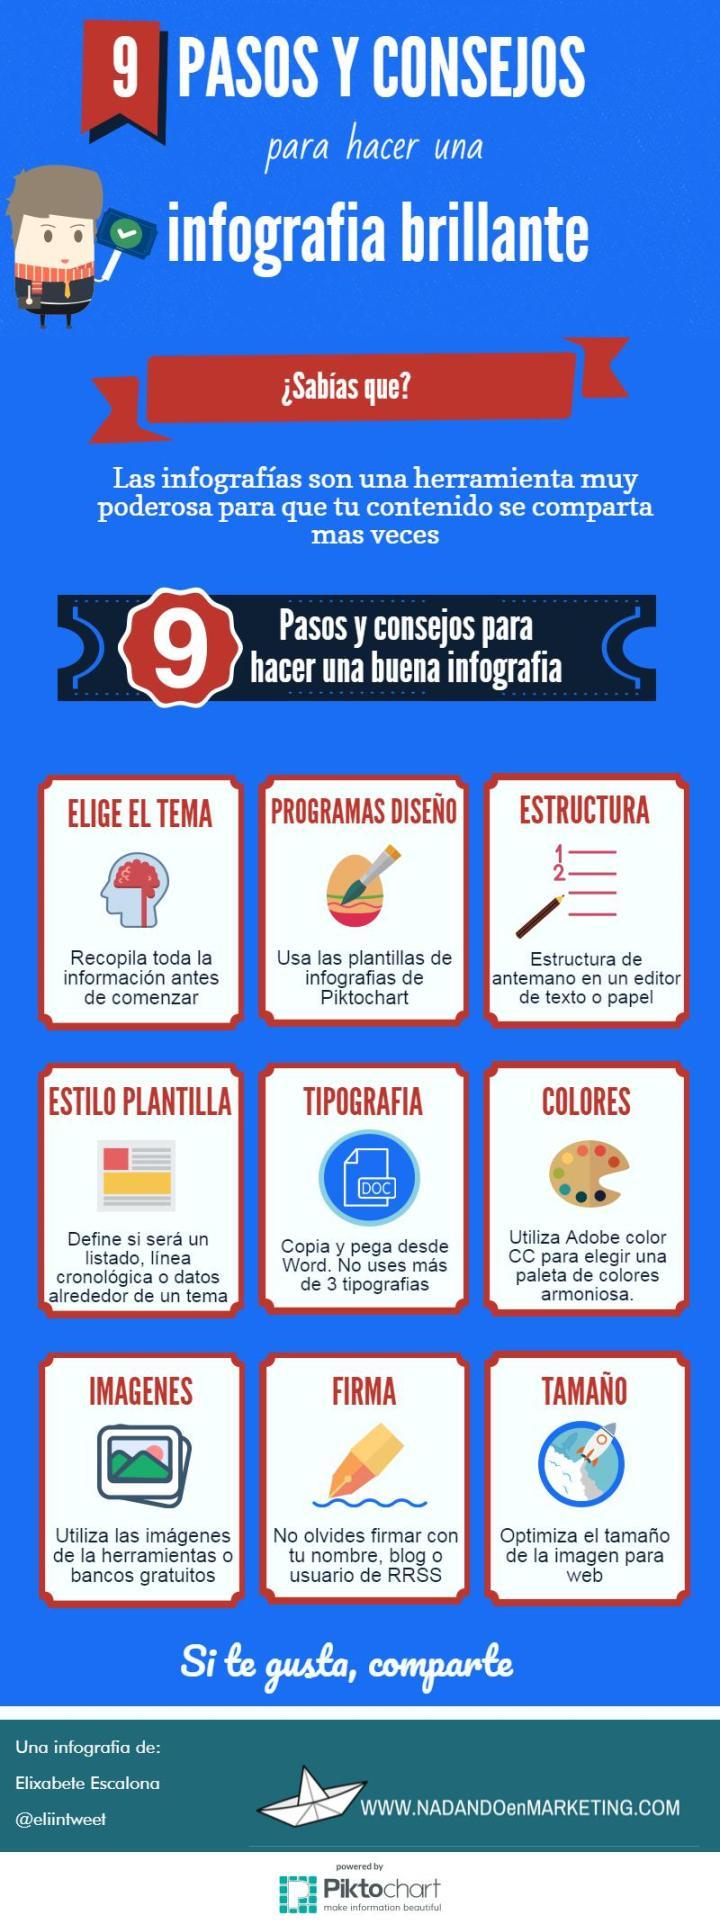 Infografia 9 pasos para una infografia brillante